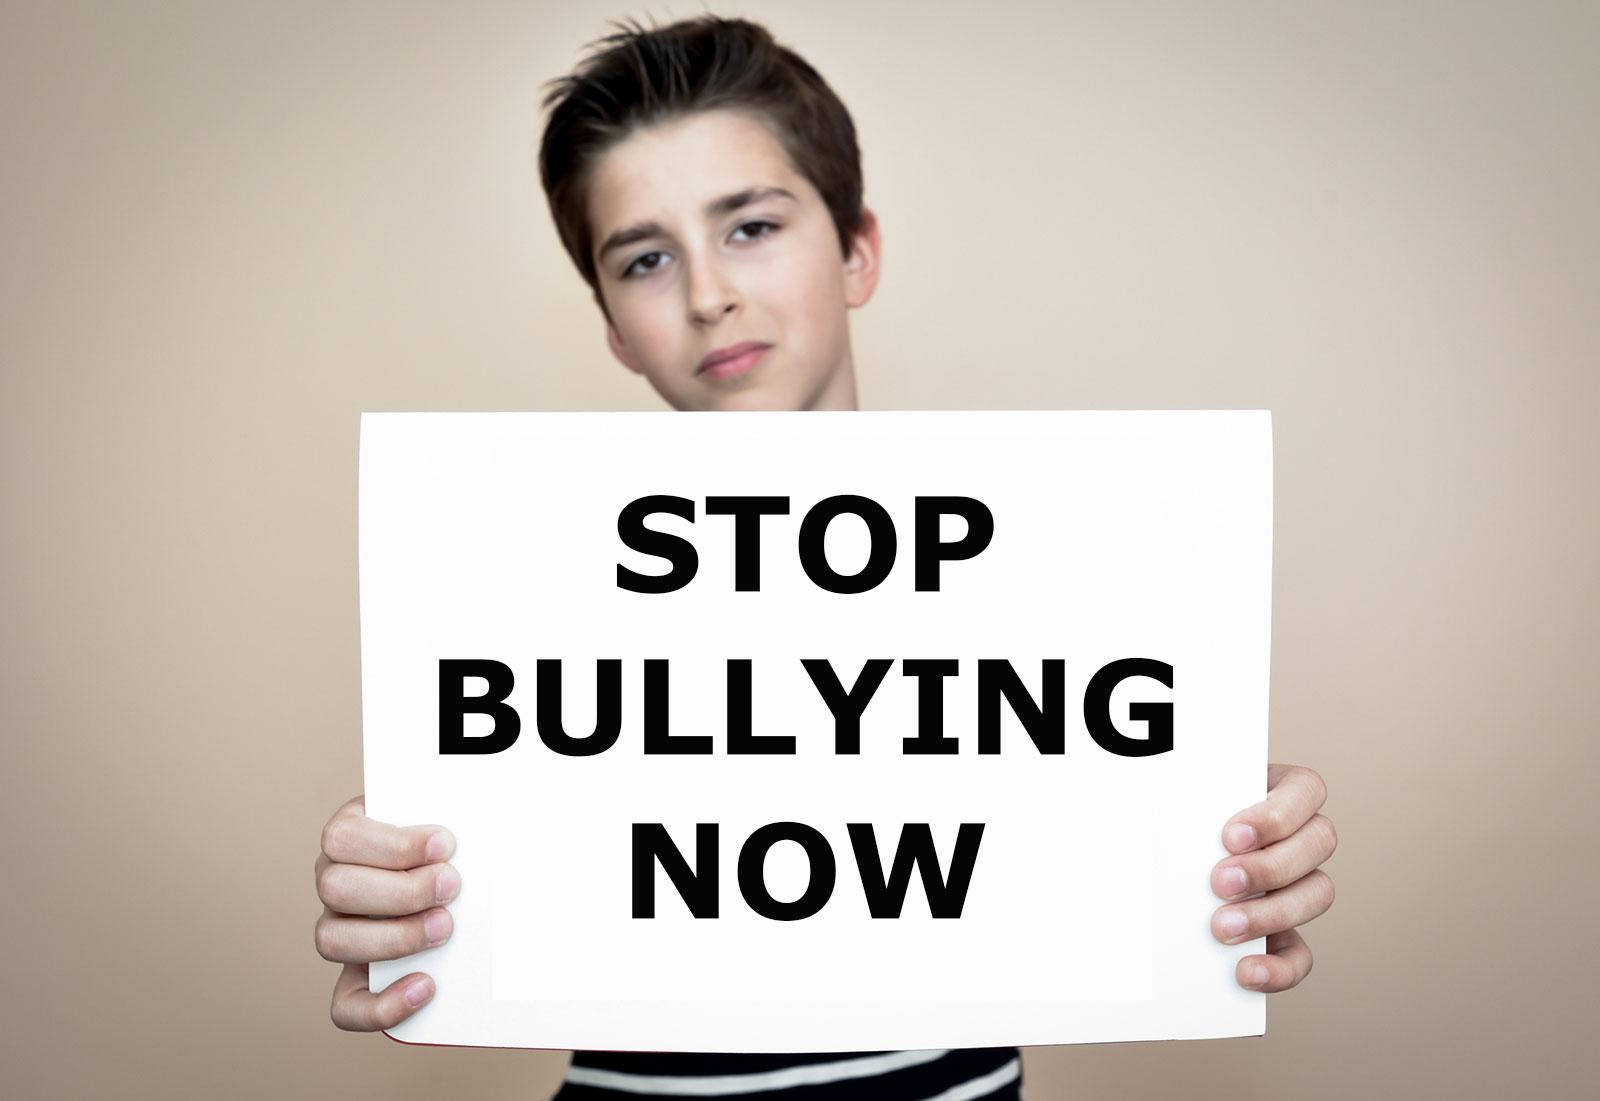 Bully Prevention Poster Ideas Lovetoknow